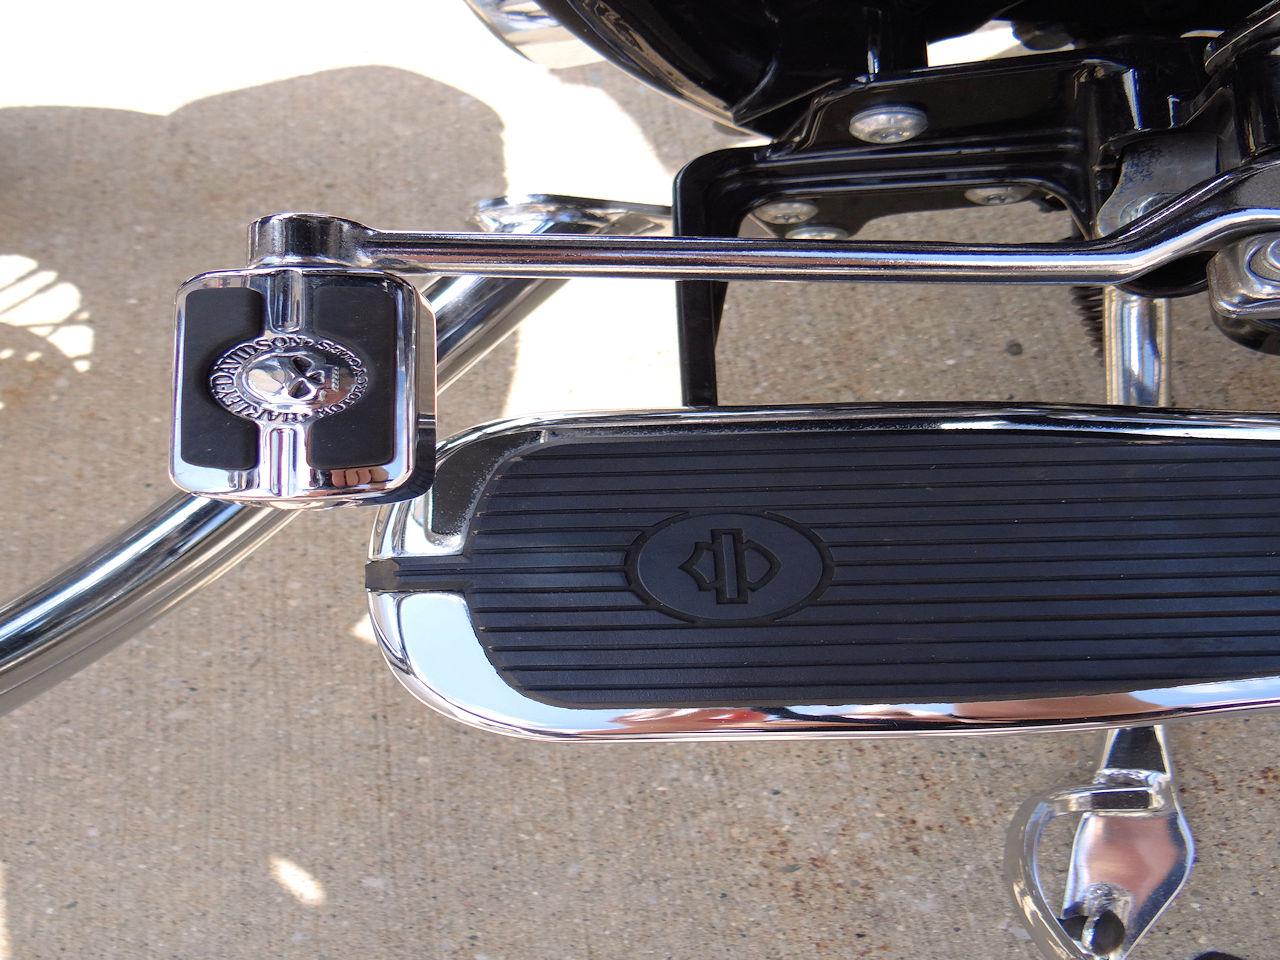 2006 Harley Davidson FLSTNI 63